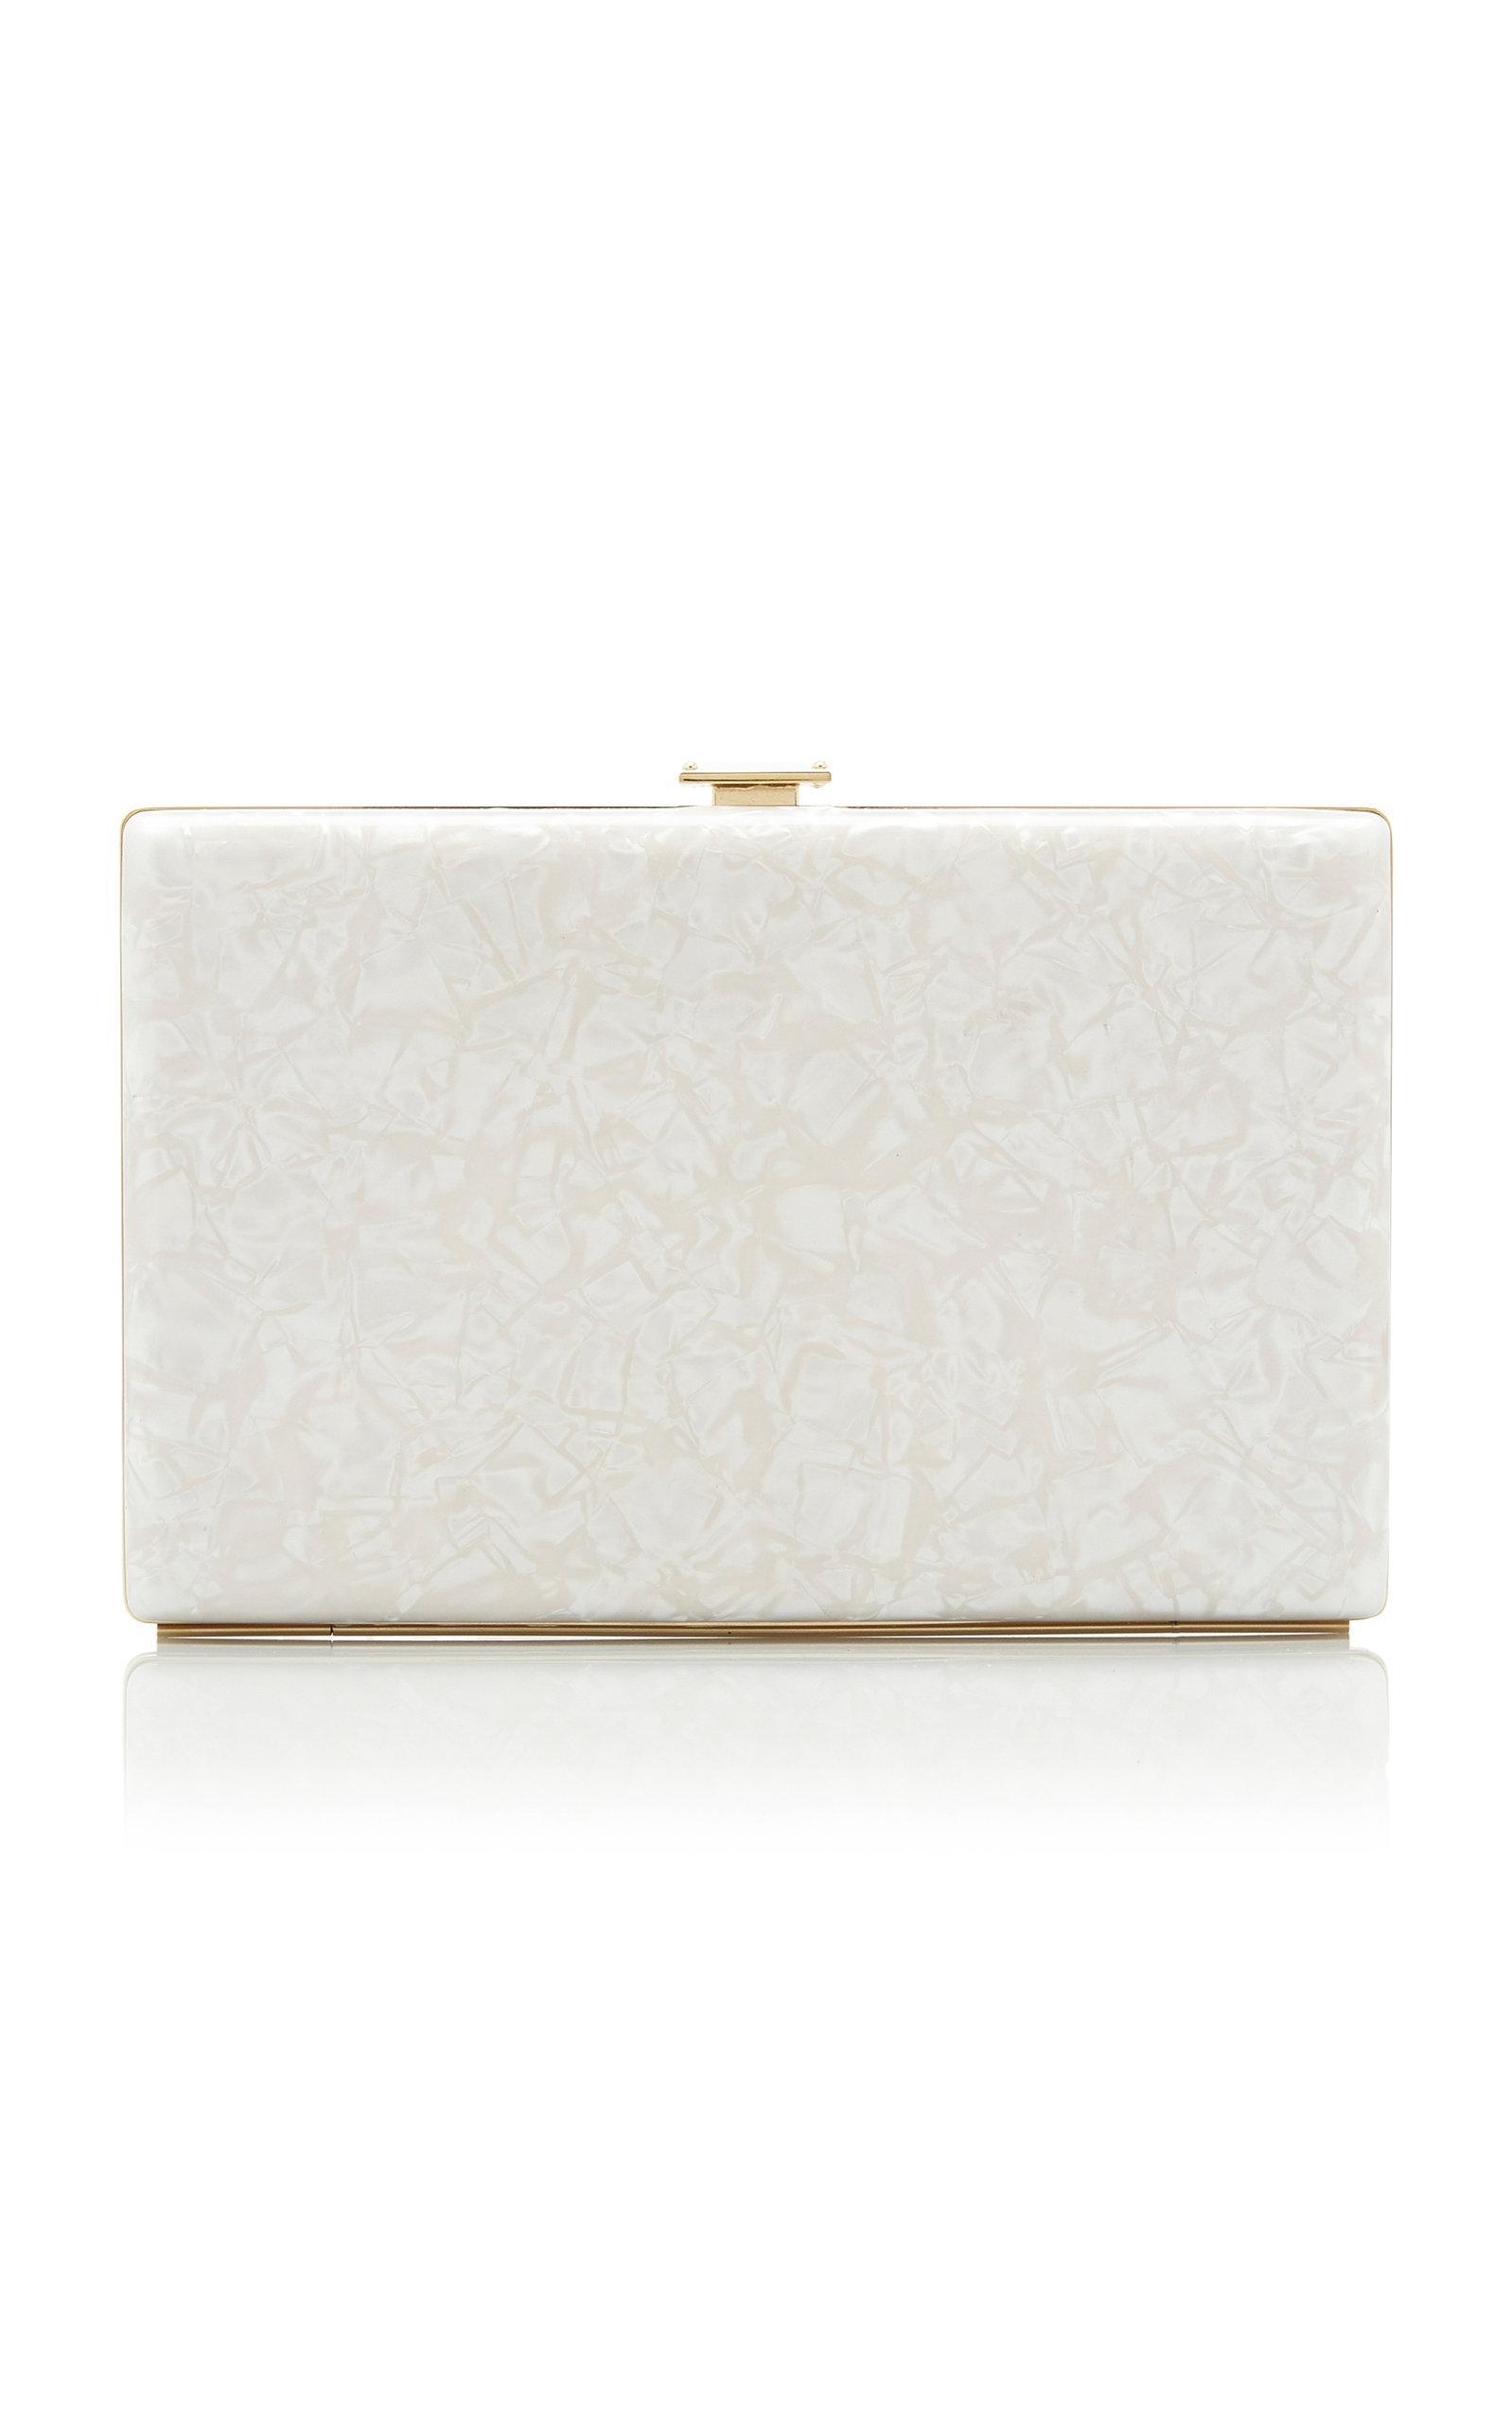 6c196e1230 Lyst - Dolce   Gabbana Pvc Micro Crossbody Bag in White